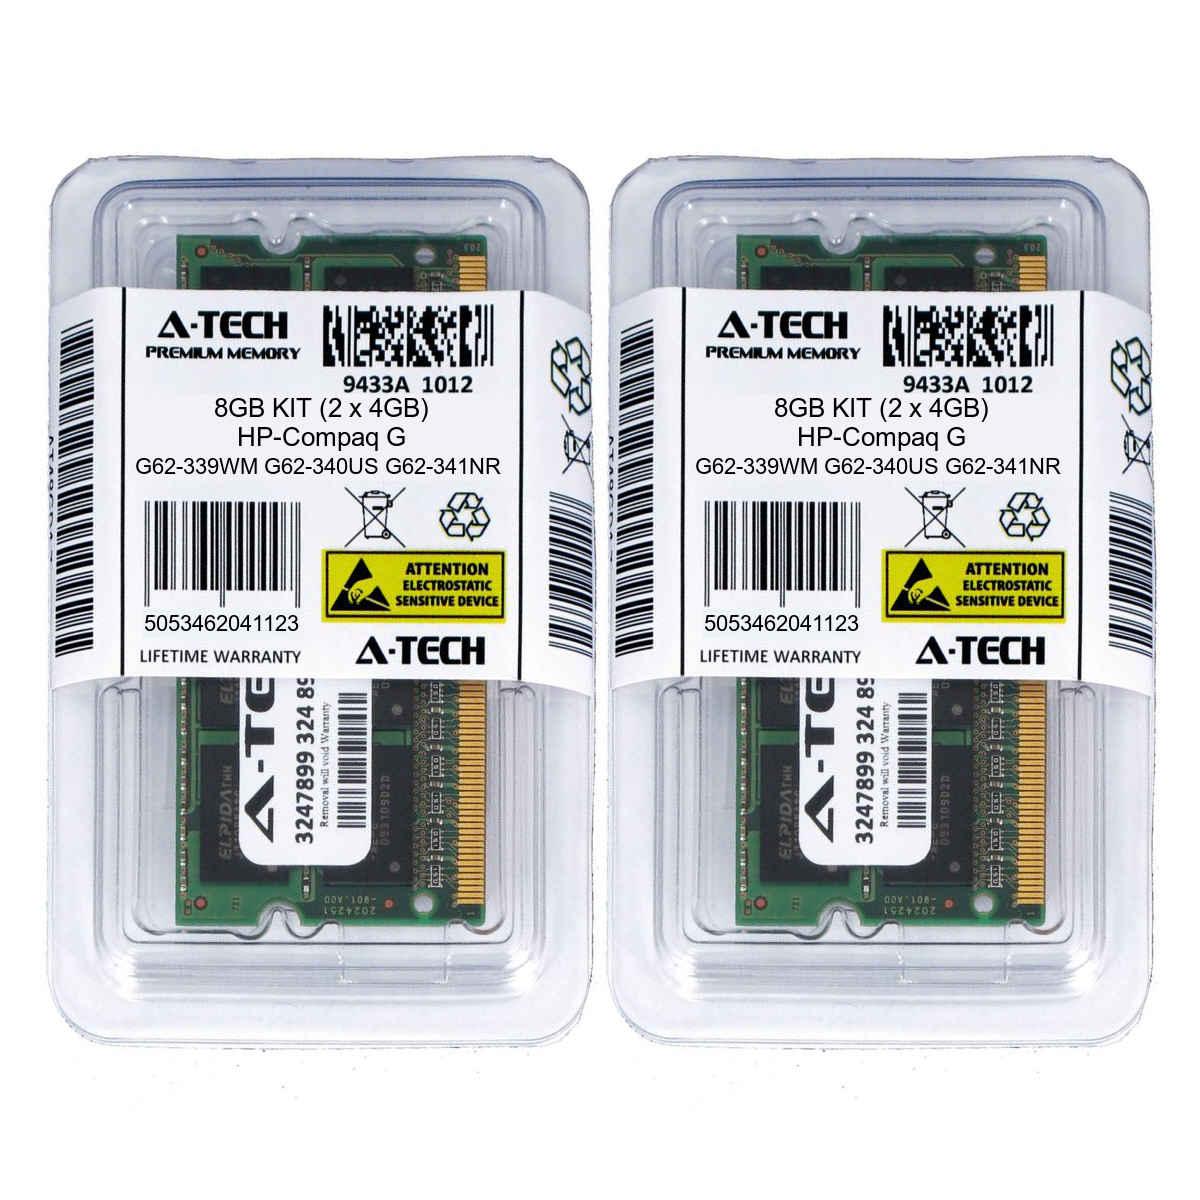 G62-341NR G62-340US 4GB Module Memory DDR3 PC3 for HP G Notebook G62-339WM